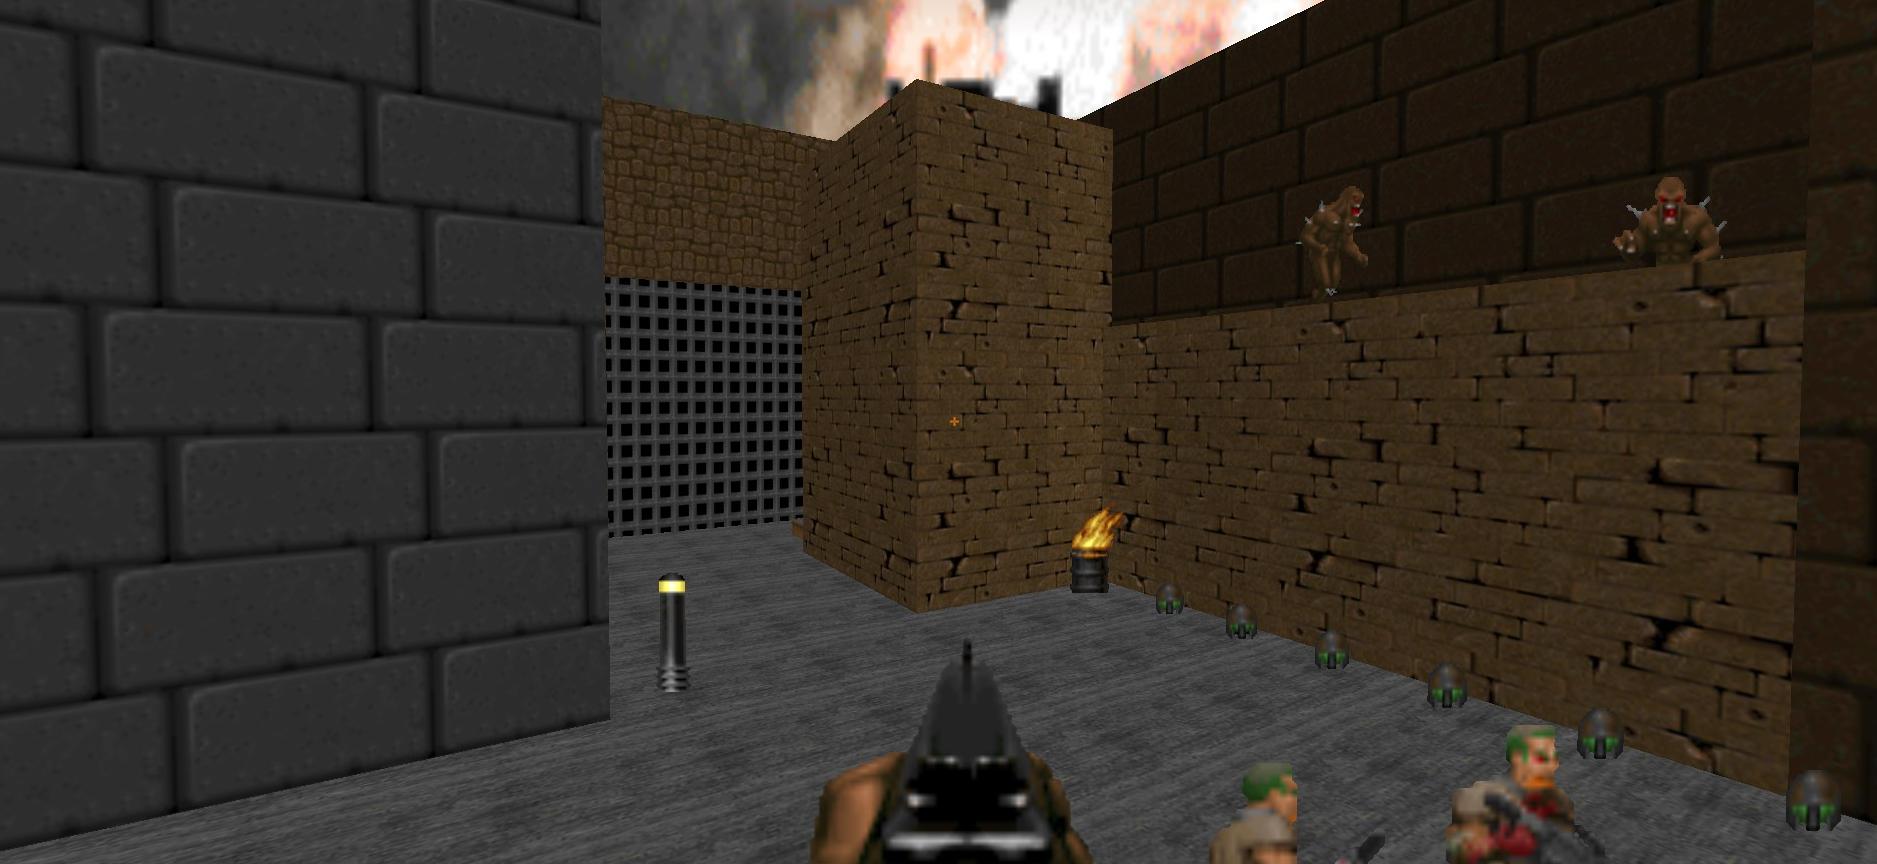 District: A Doom 2 map